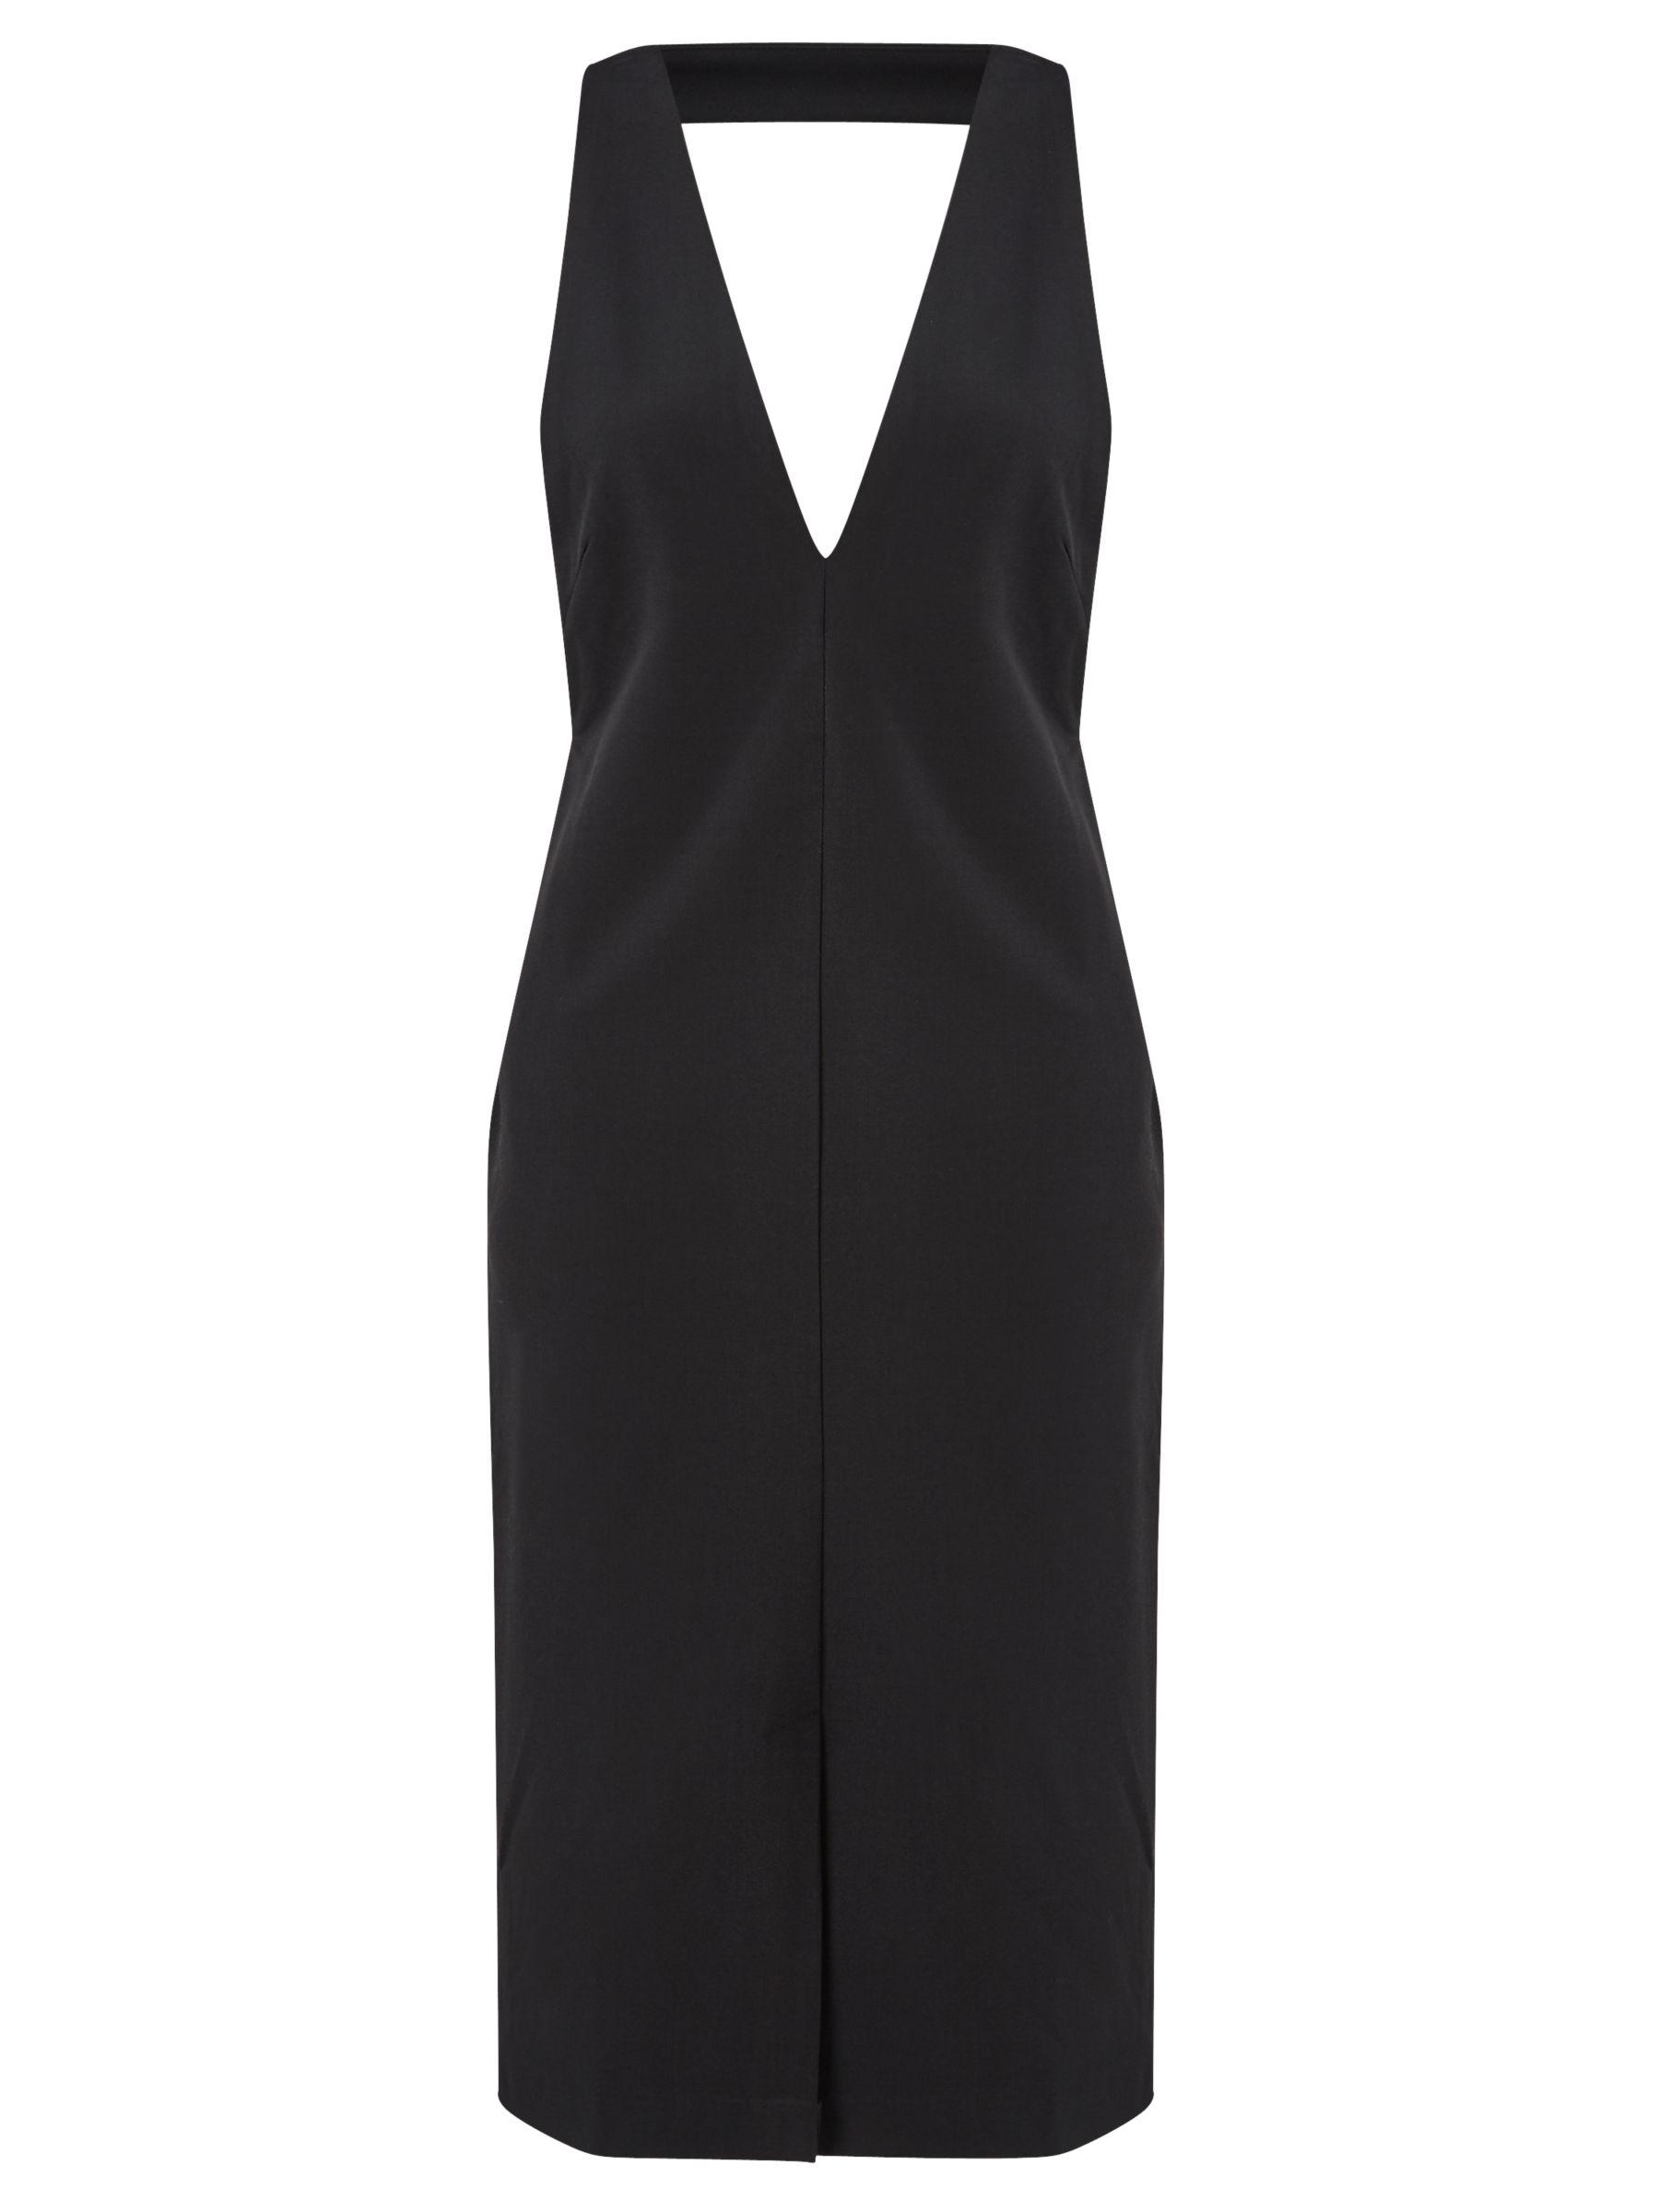 Numph Numph Jovina Pinafore Dress, Black